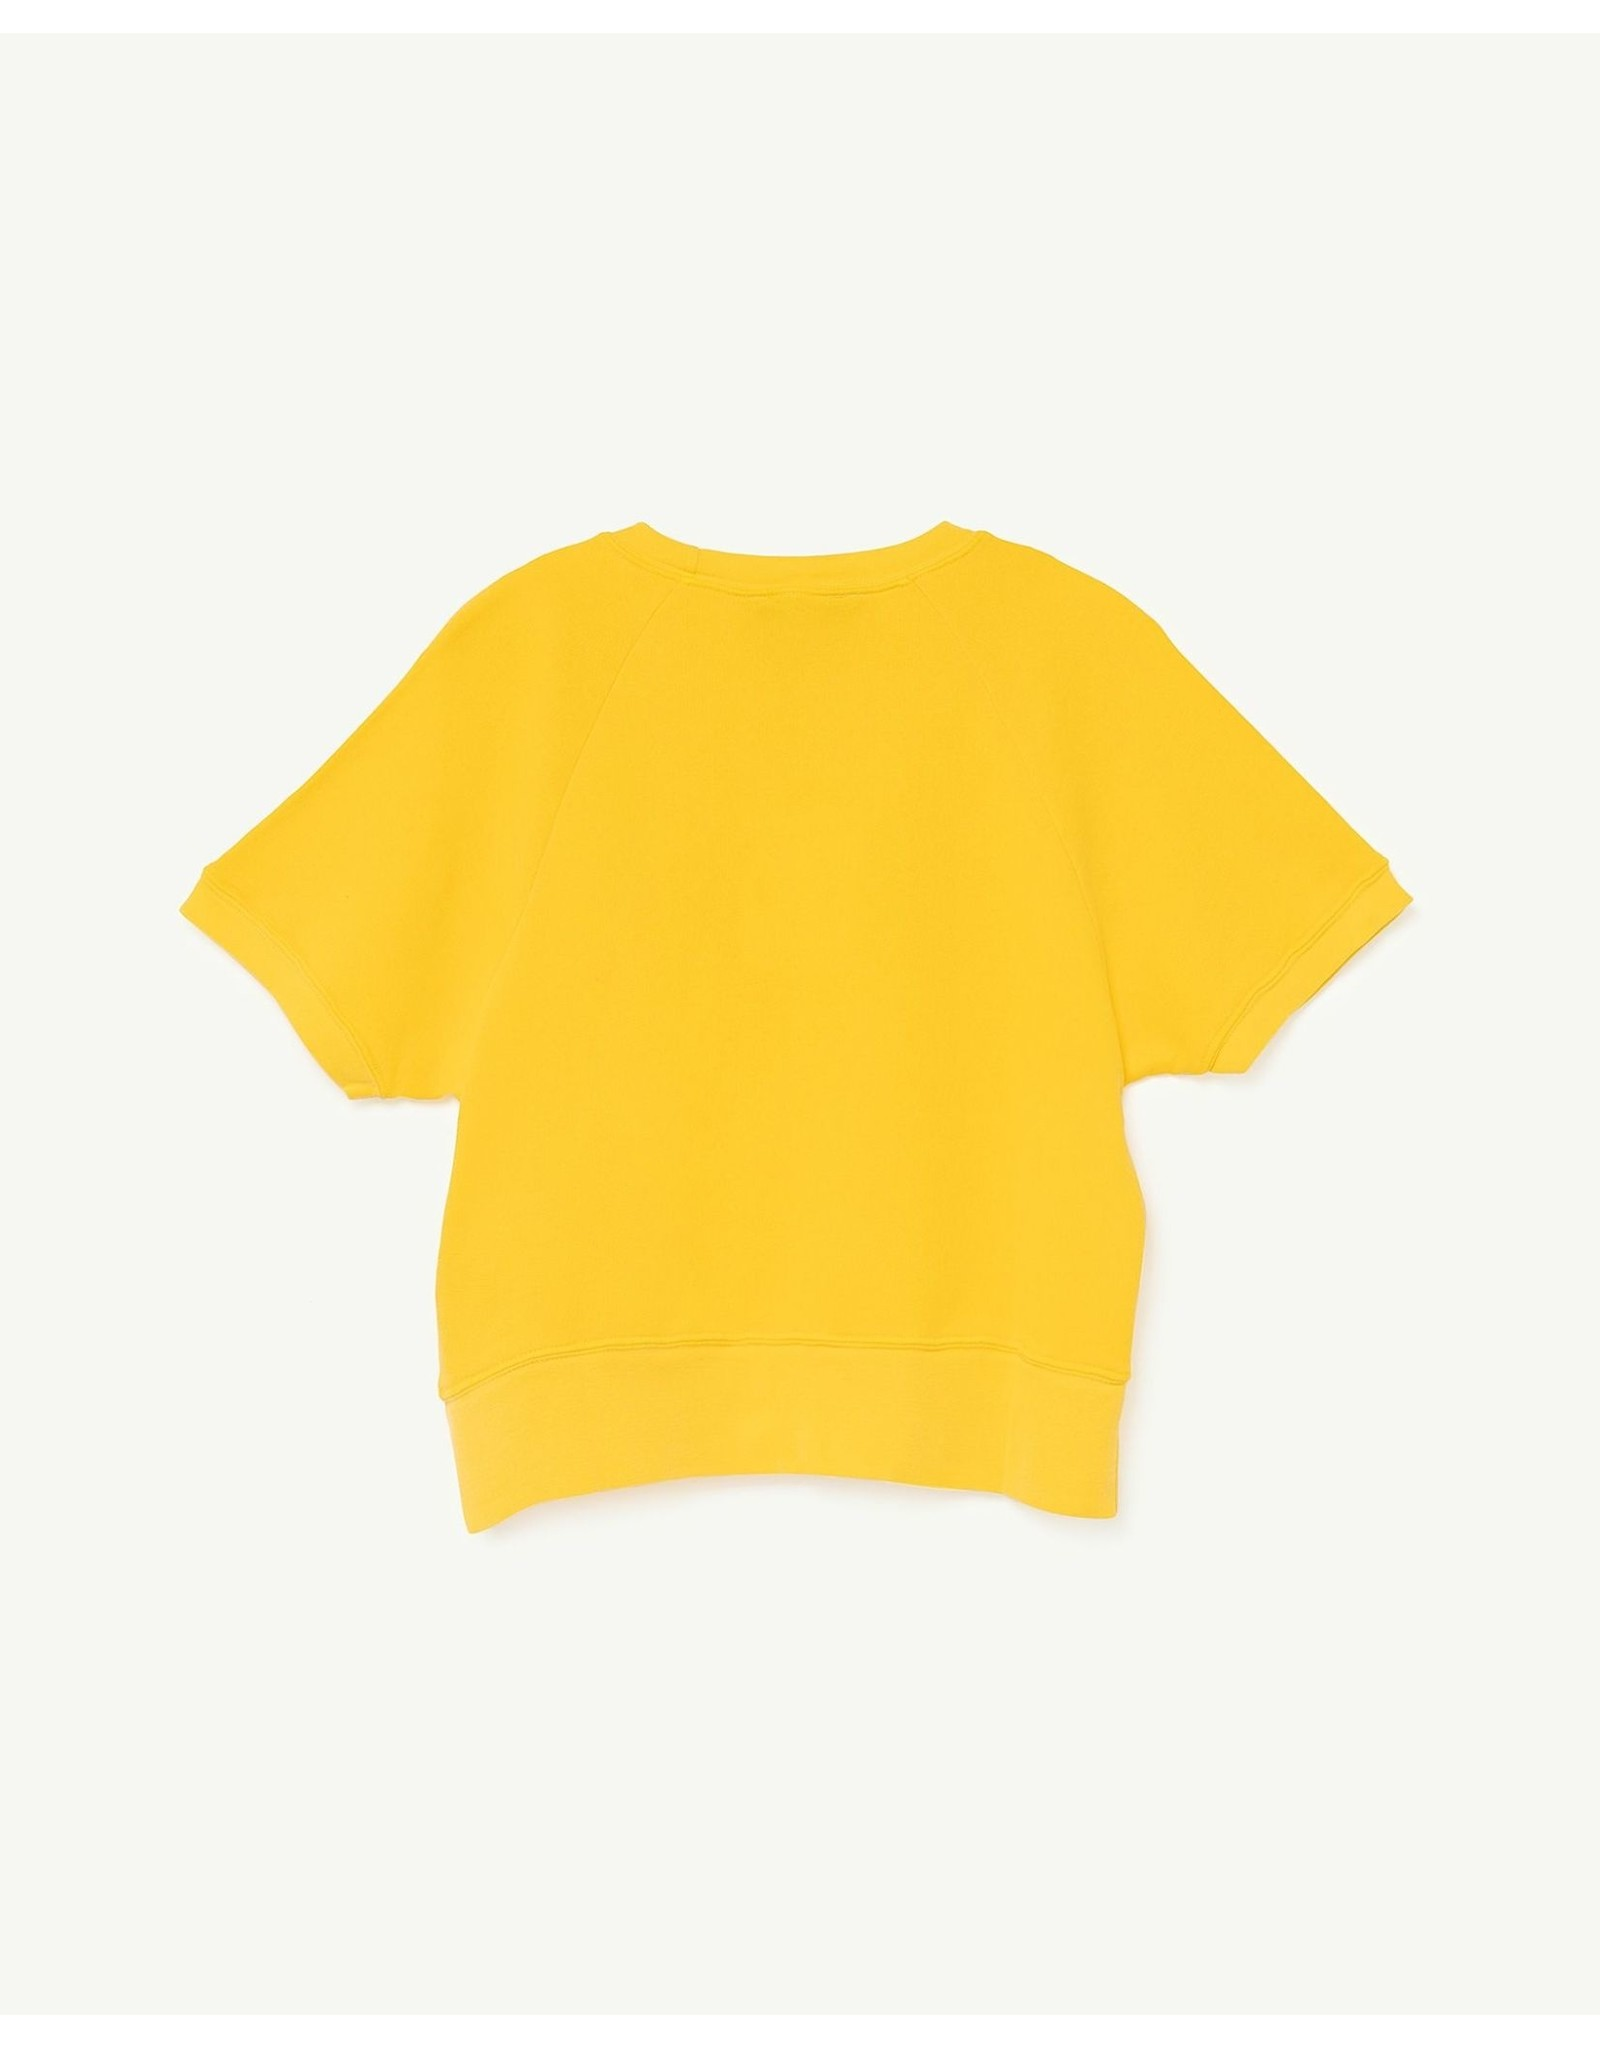 TAO PS21 007203AS Squab Kids T-Shirt yellow